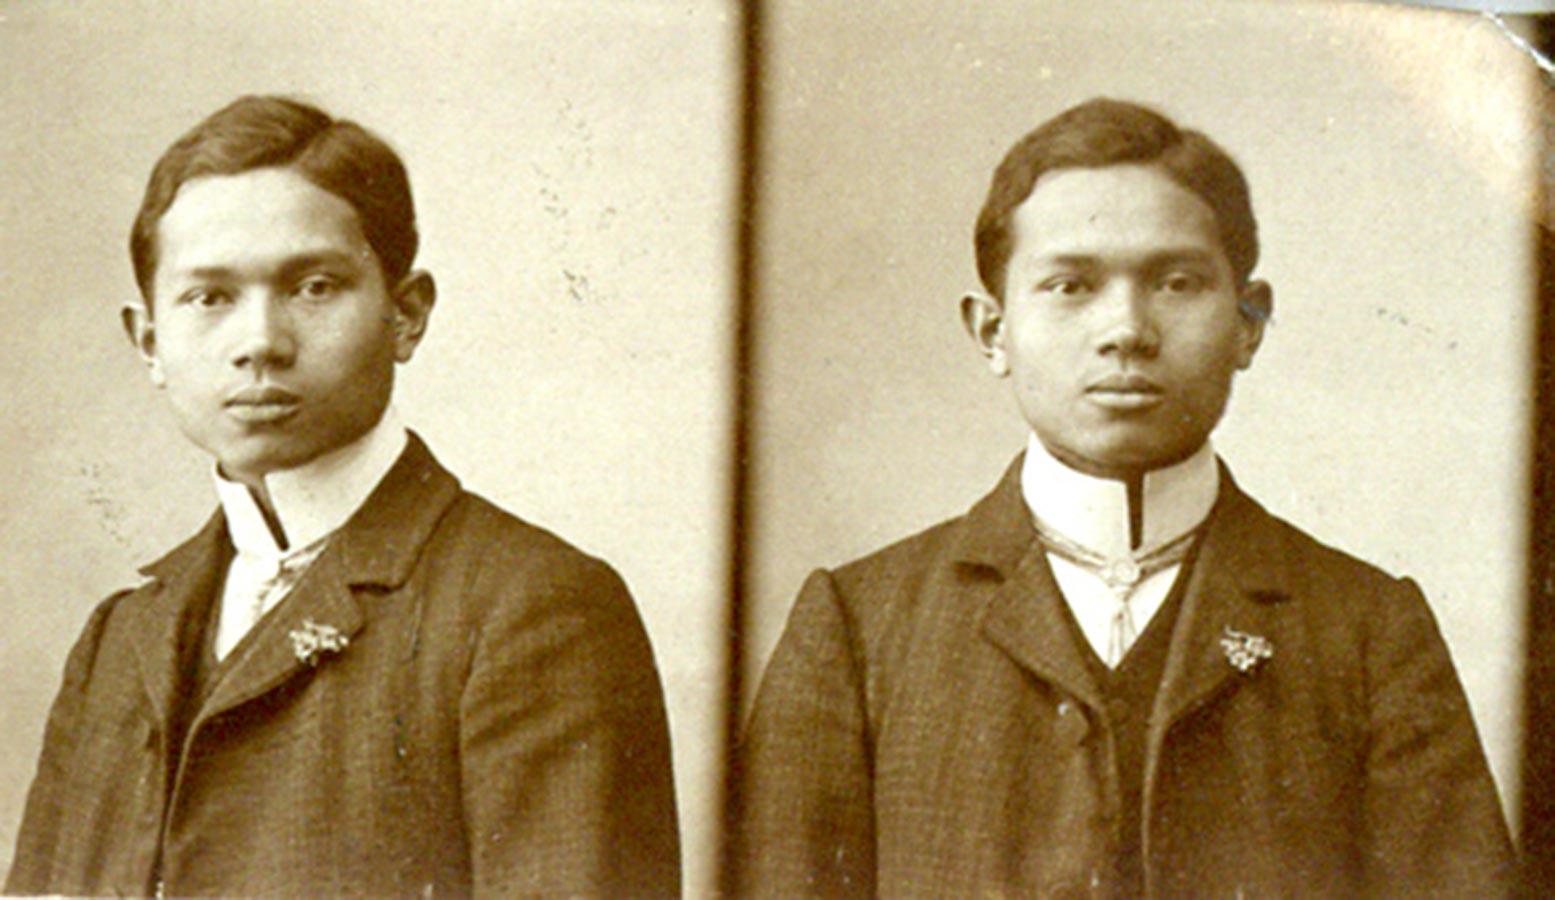 Tillmann Joseph Schmitz du Moulin, ca. 1905 © photographe inconnu, drotis réservés